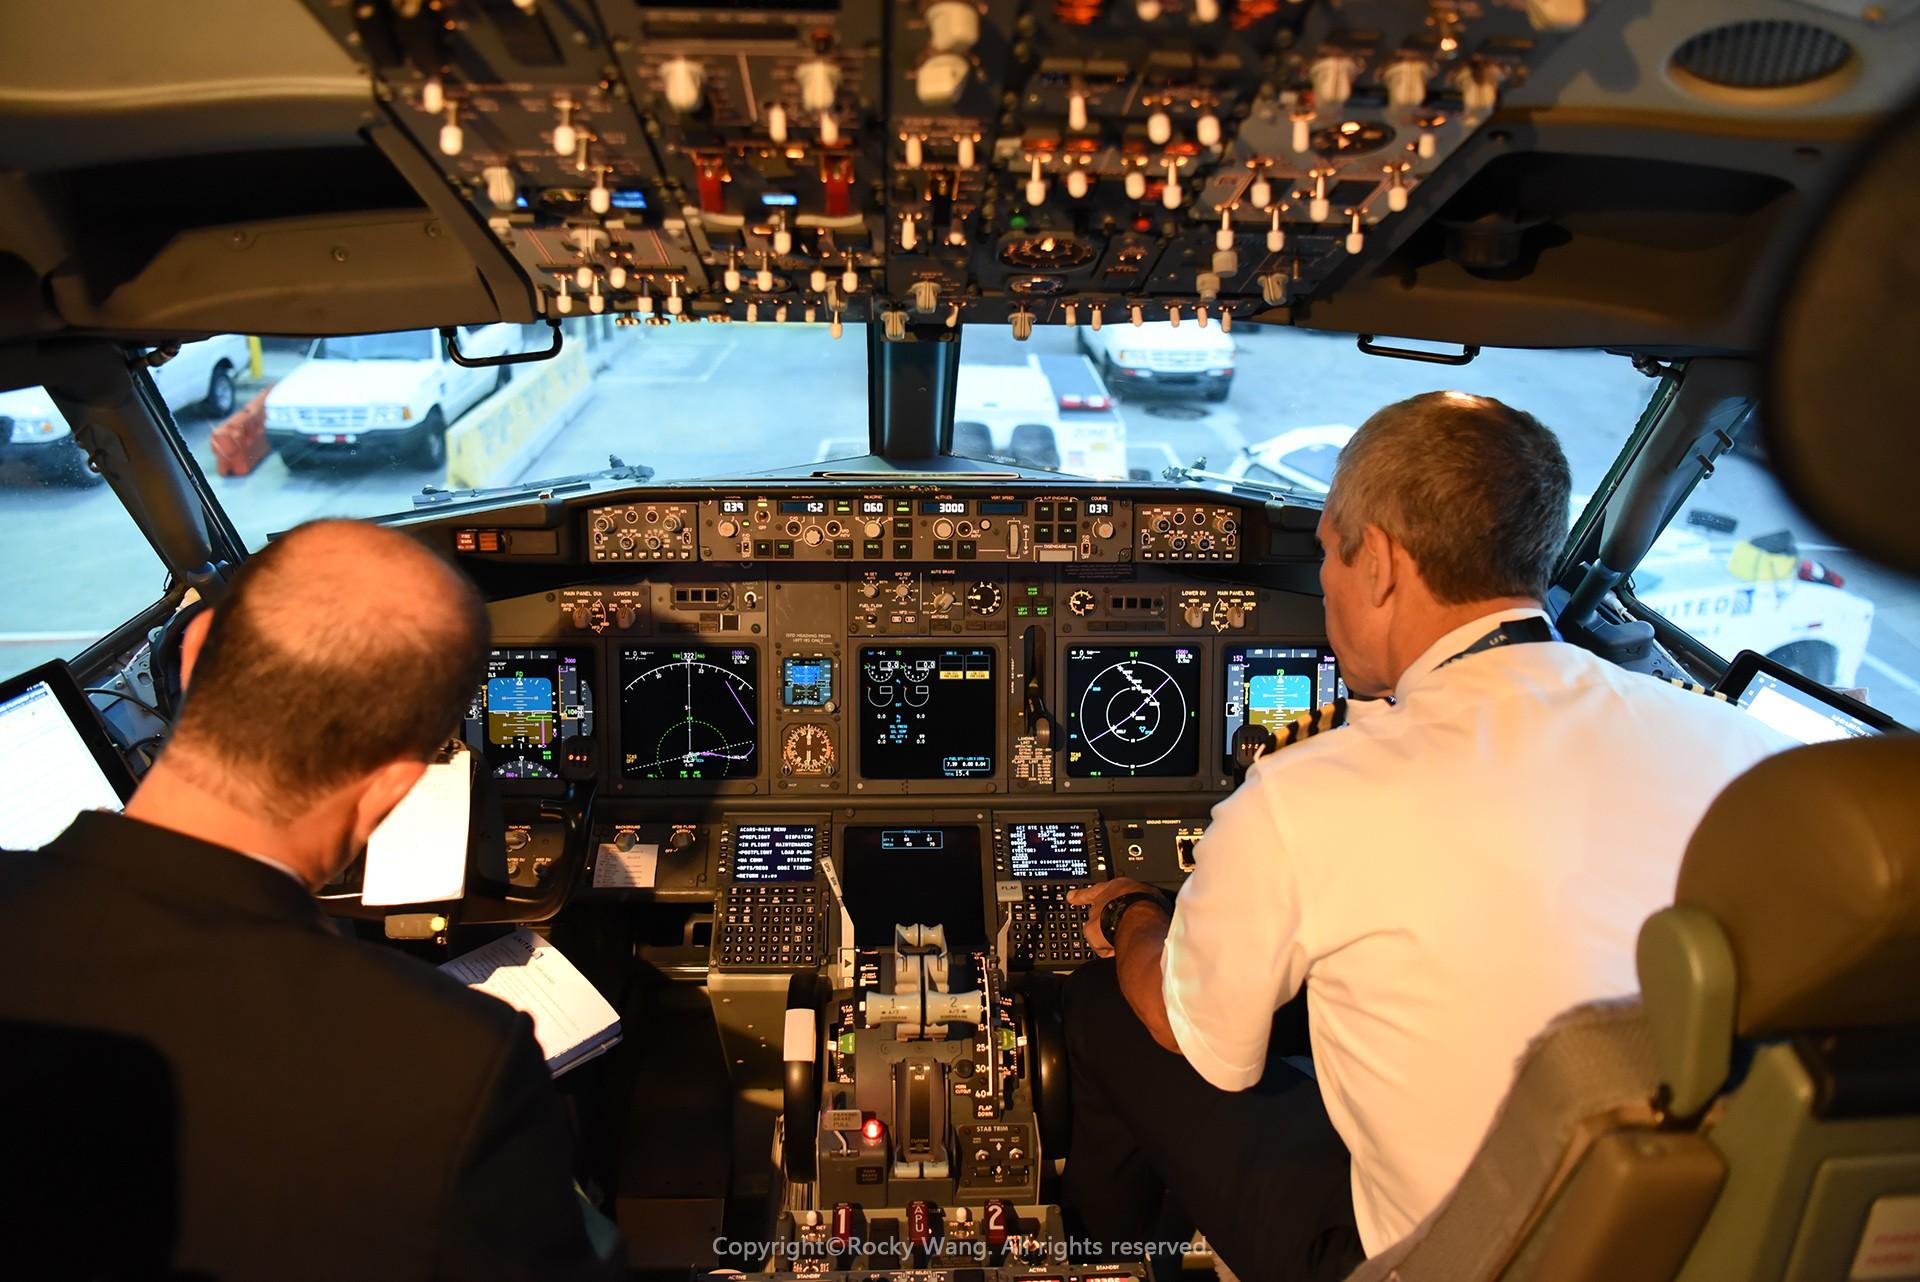 Re:[原创]简易版游记,纪念一次30段的环球飞行和一些碎碎念 BOEING 737-924ER N69888 Newark Int'l Airport